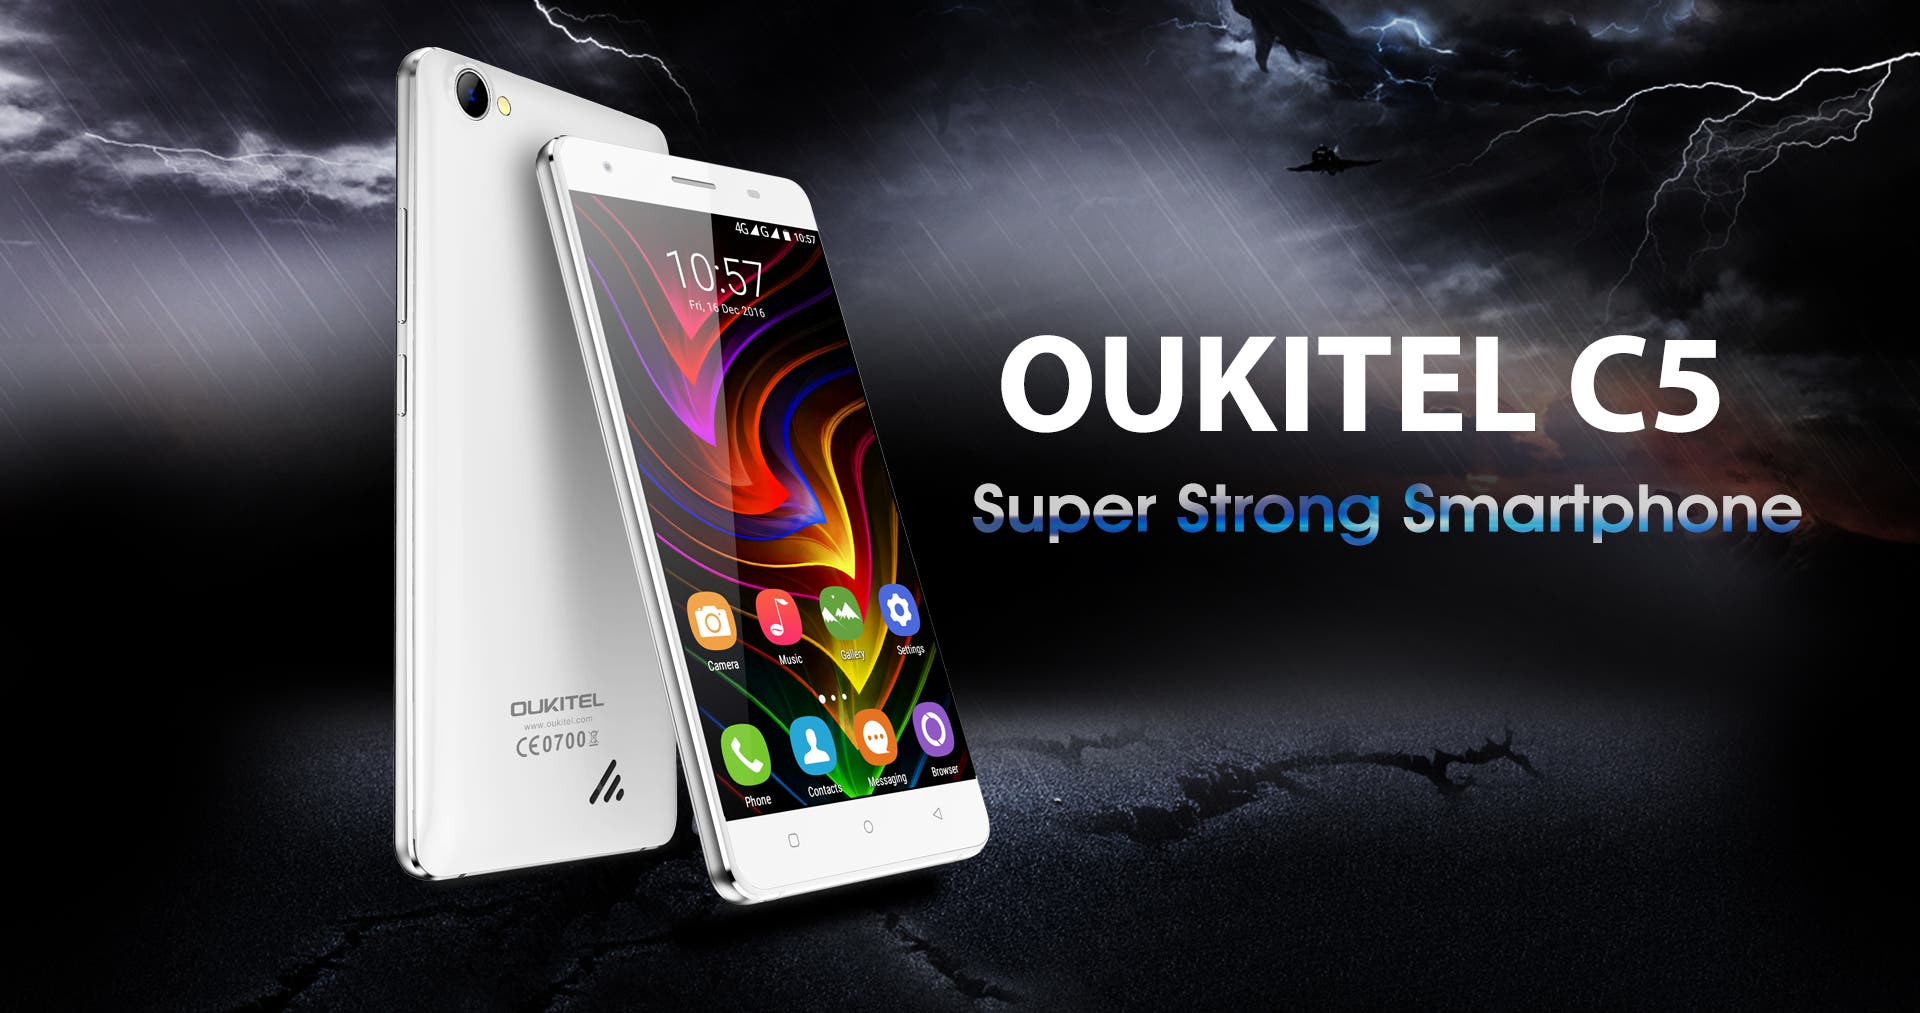 oukitelc5